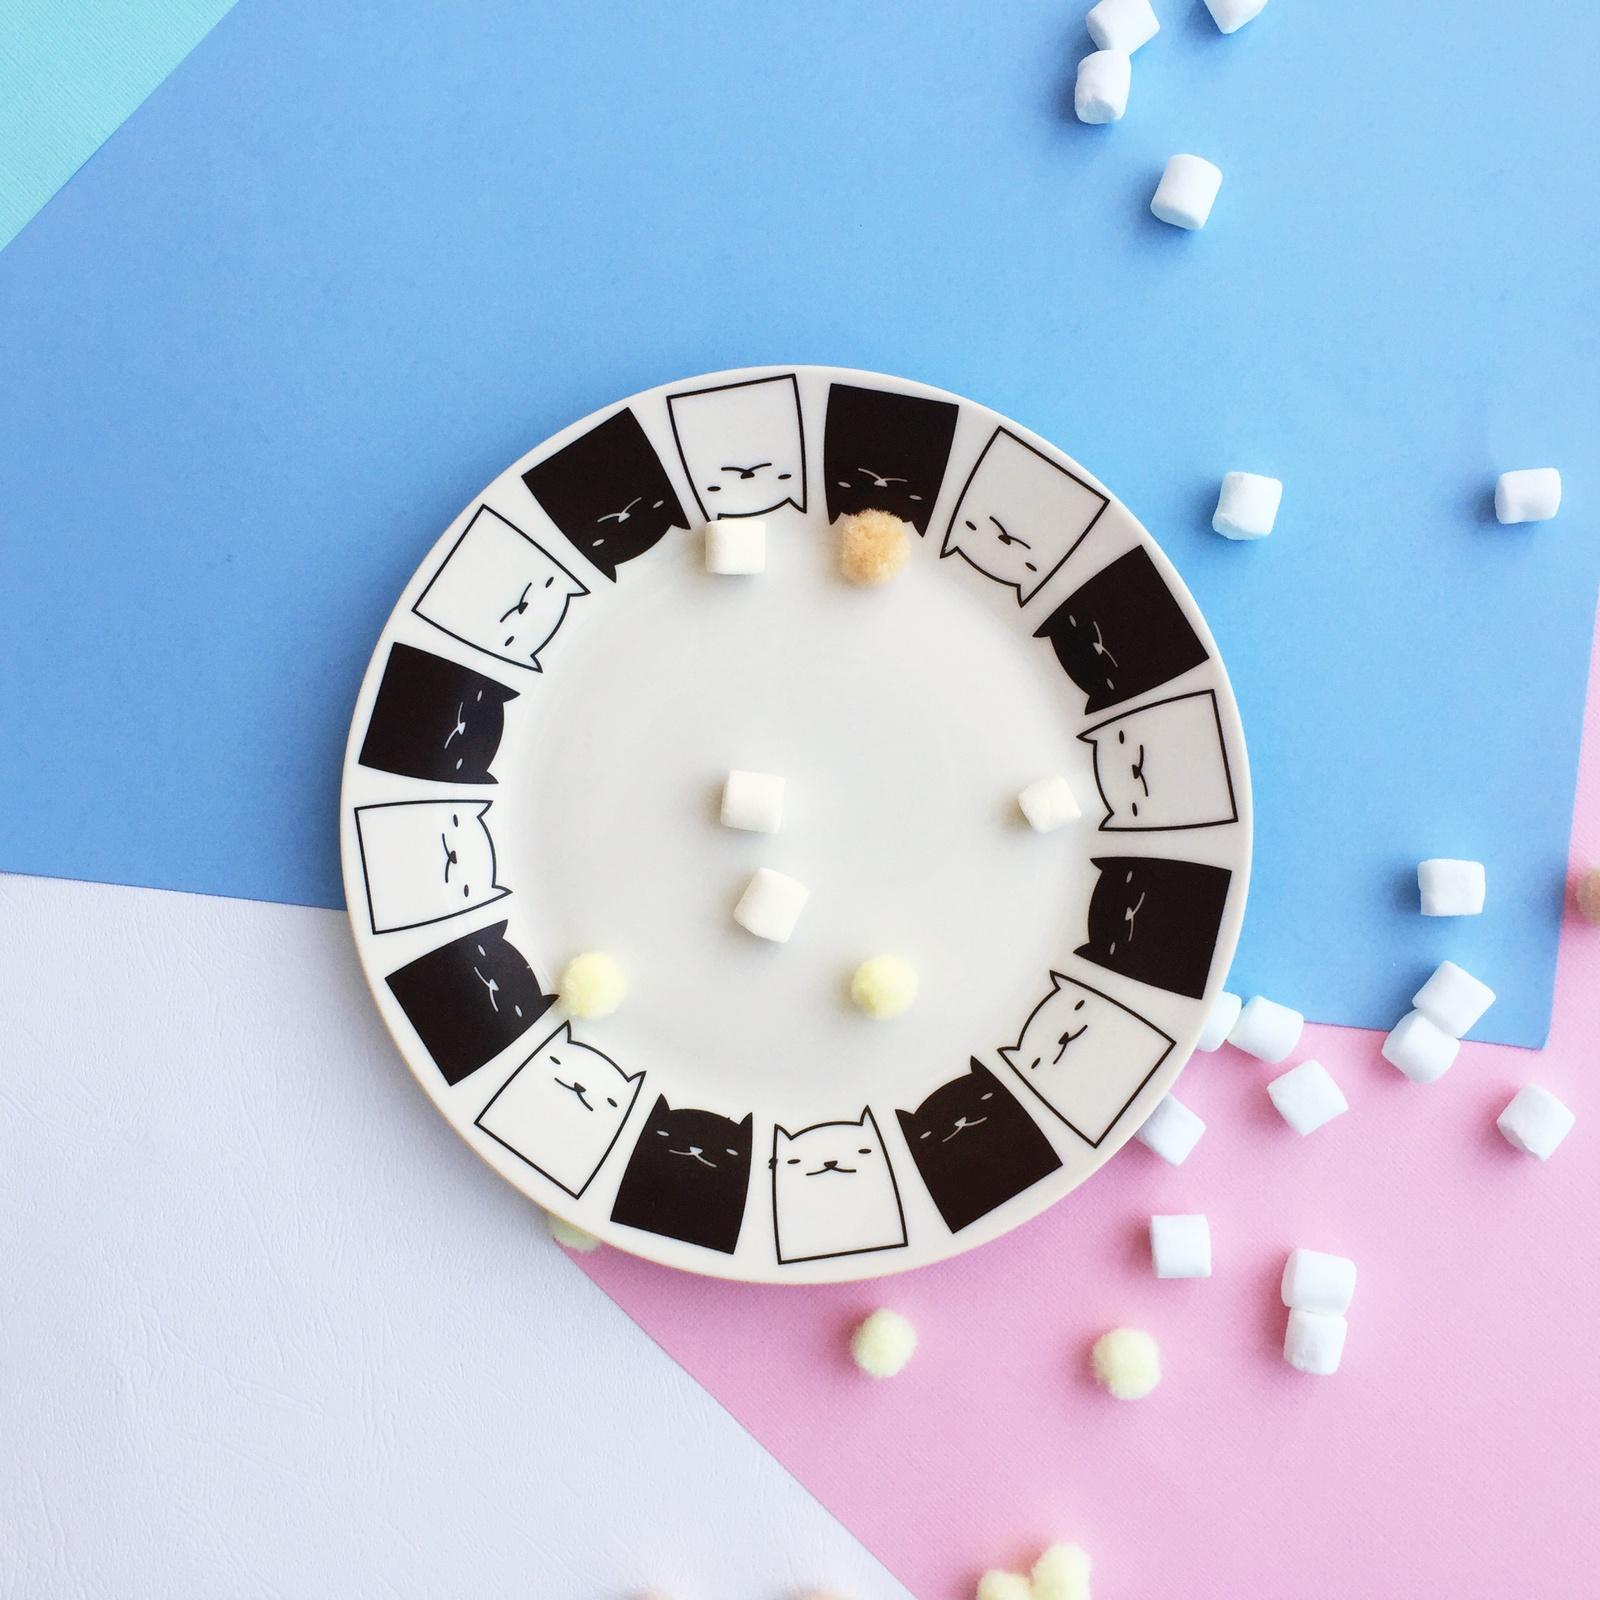 Тарелка Сотвори Чудо Котята 20 см, белый тарелка мелкая сотвори чудо бантик sans brides диаметр 20 см